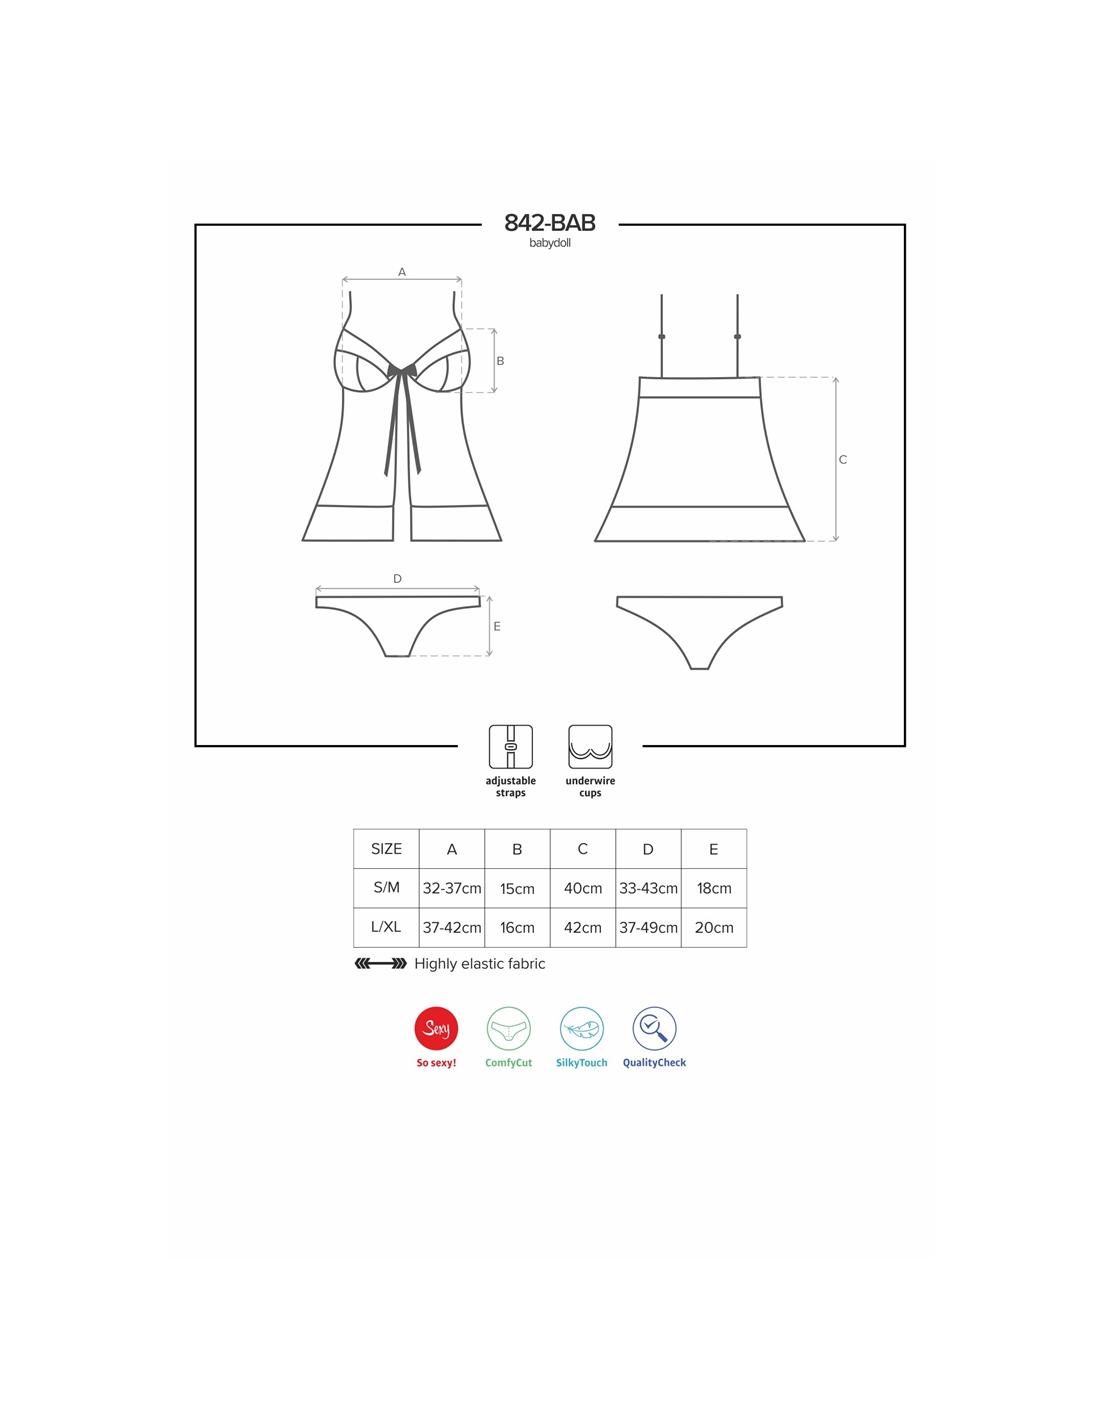 Camisa De Noite E Cueca 842-Bab Obsessive Preto - 40-42 L/XL - PR2010352350